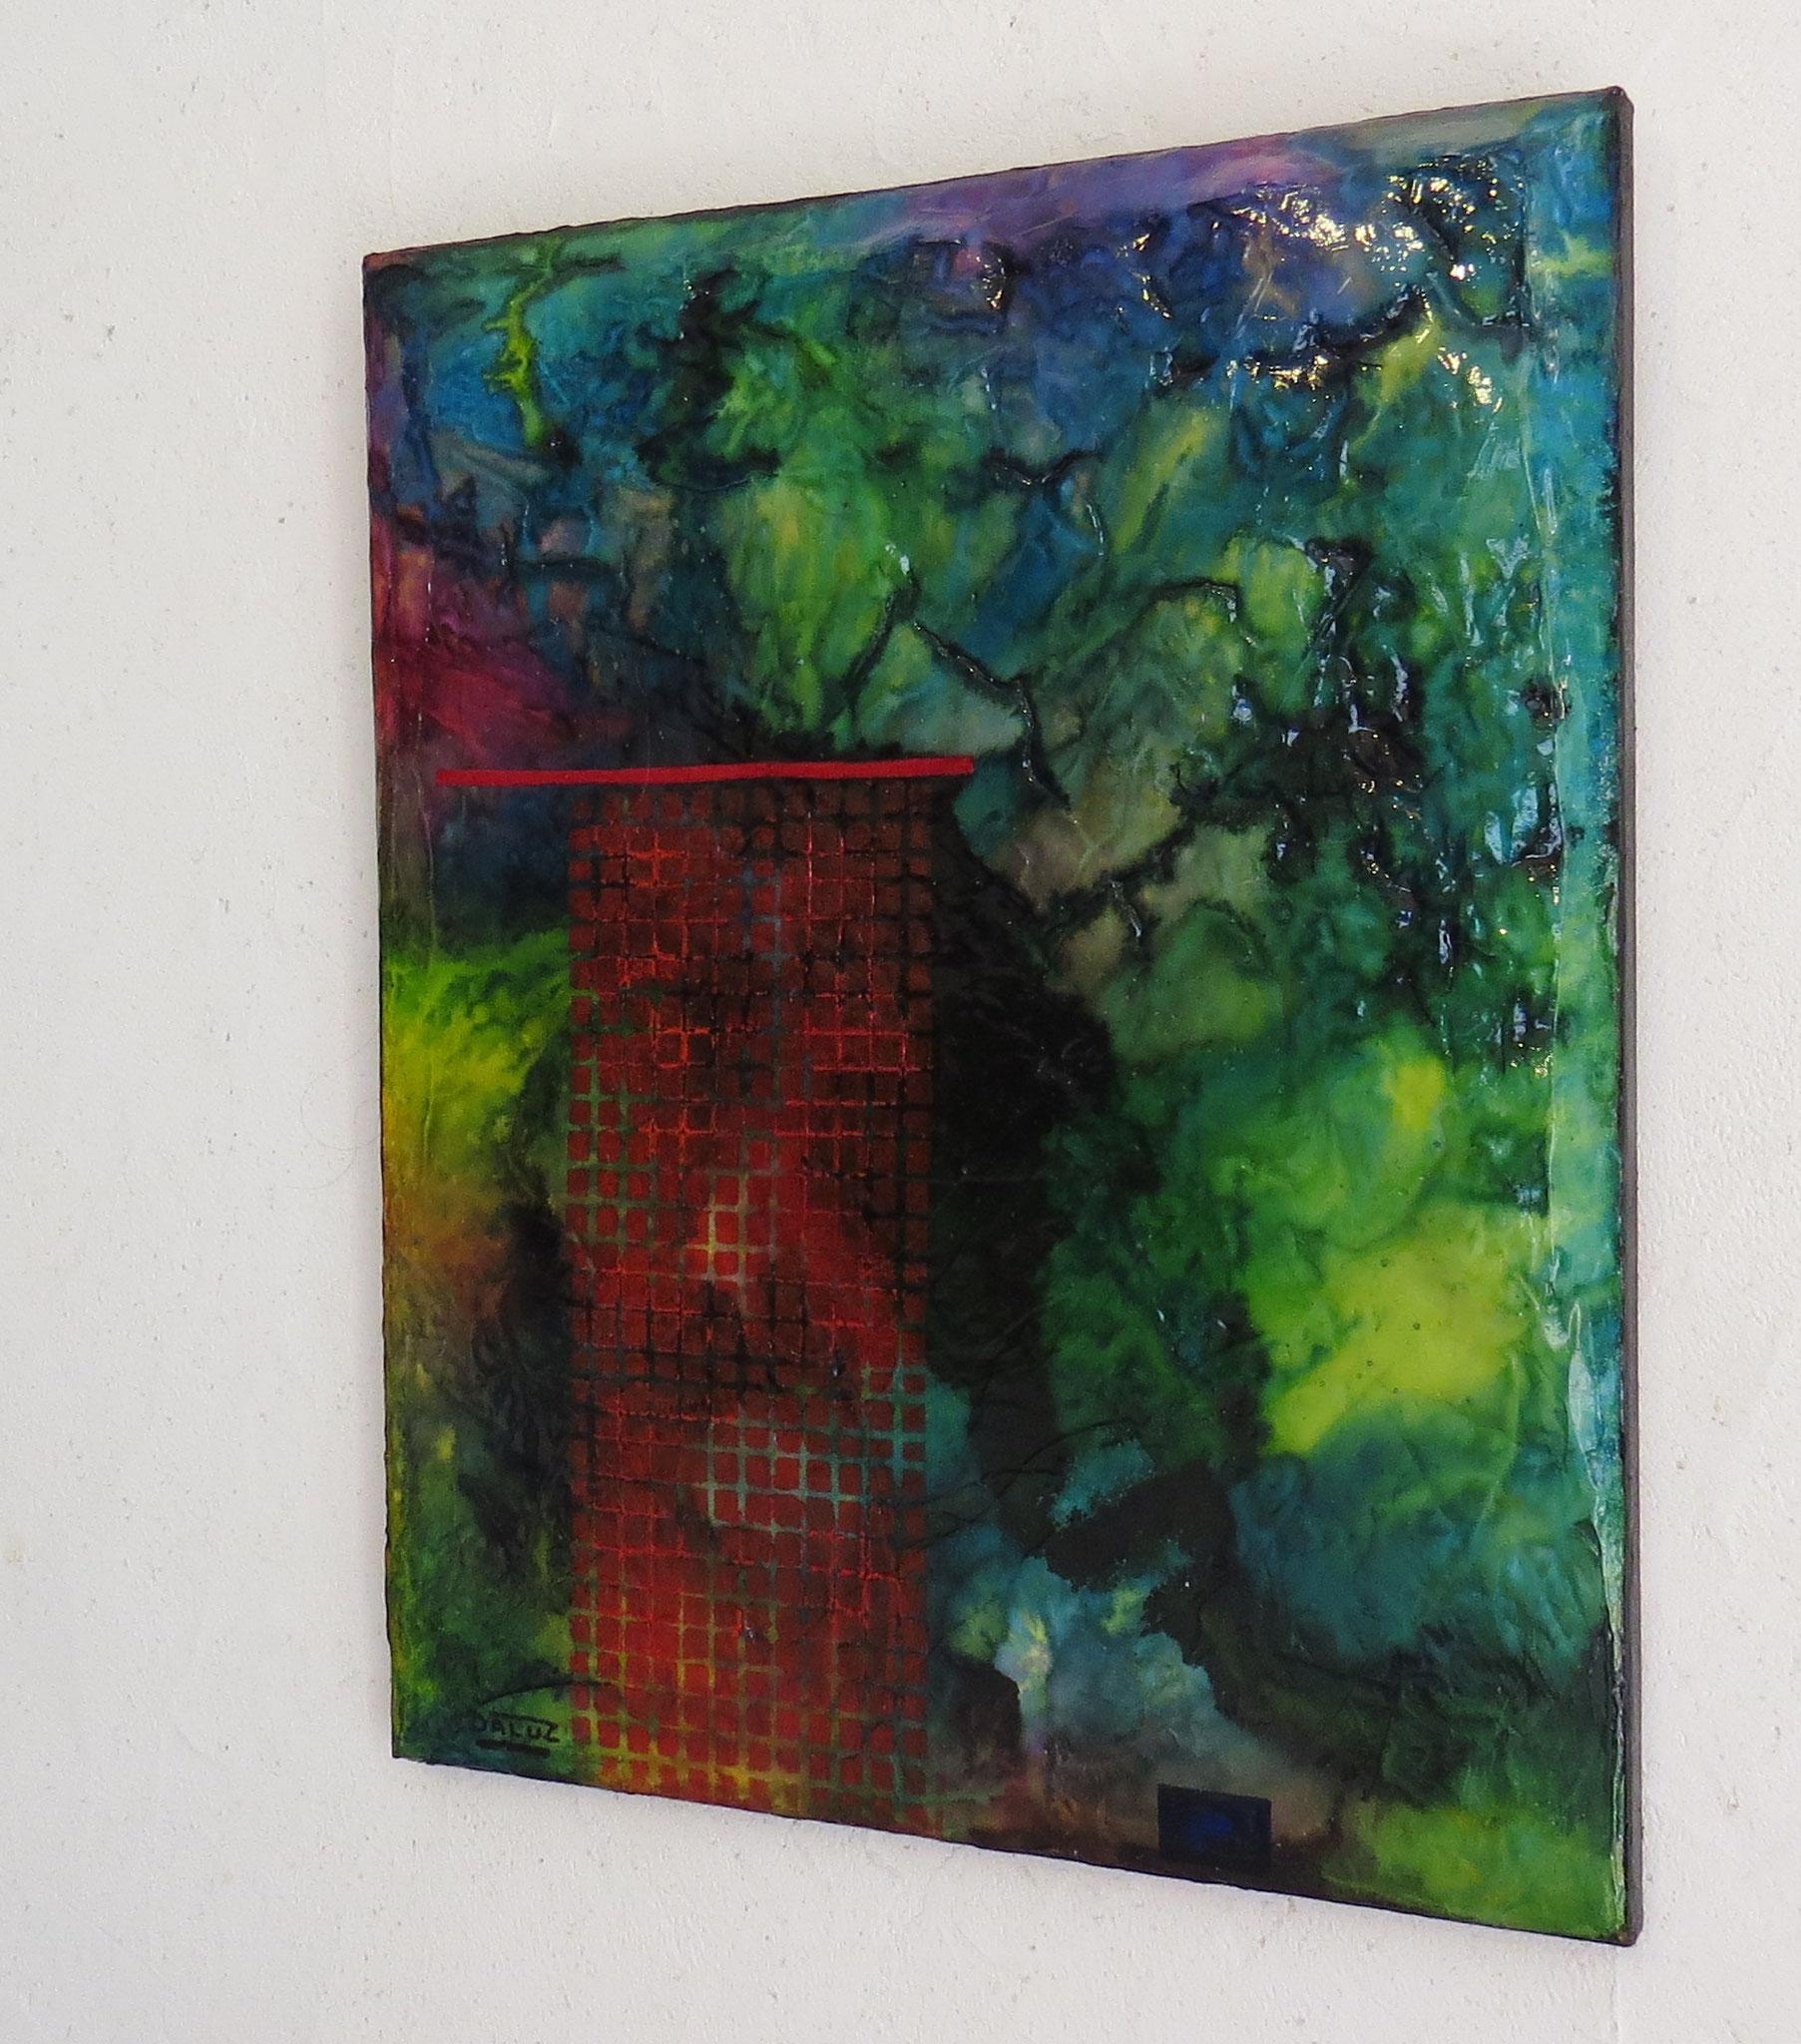 nimbes - vue côté2 - DALUZ GALEGO - peinture abstraite